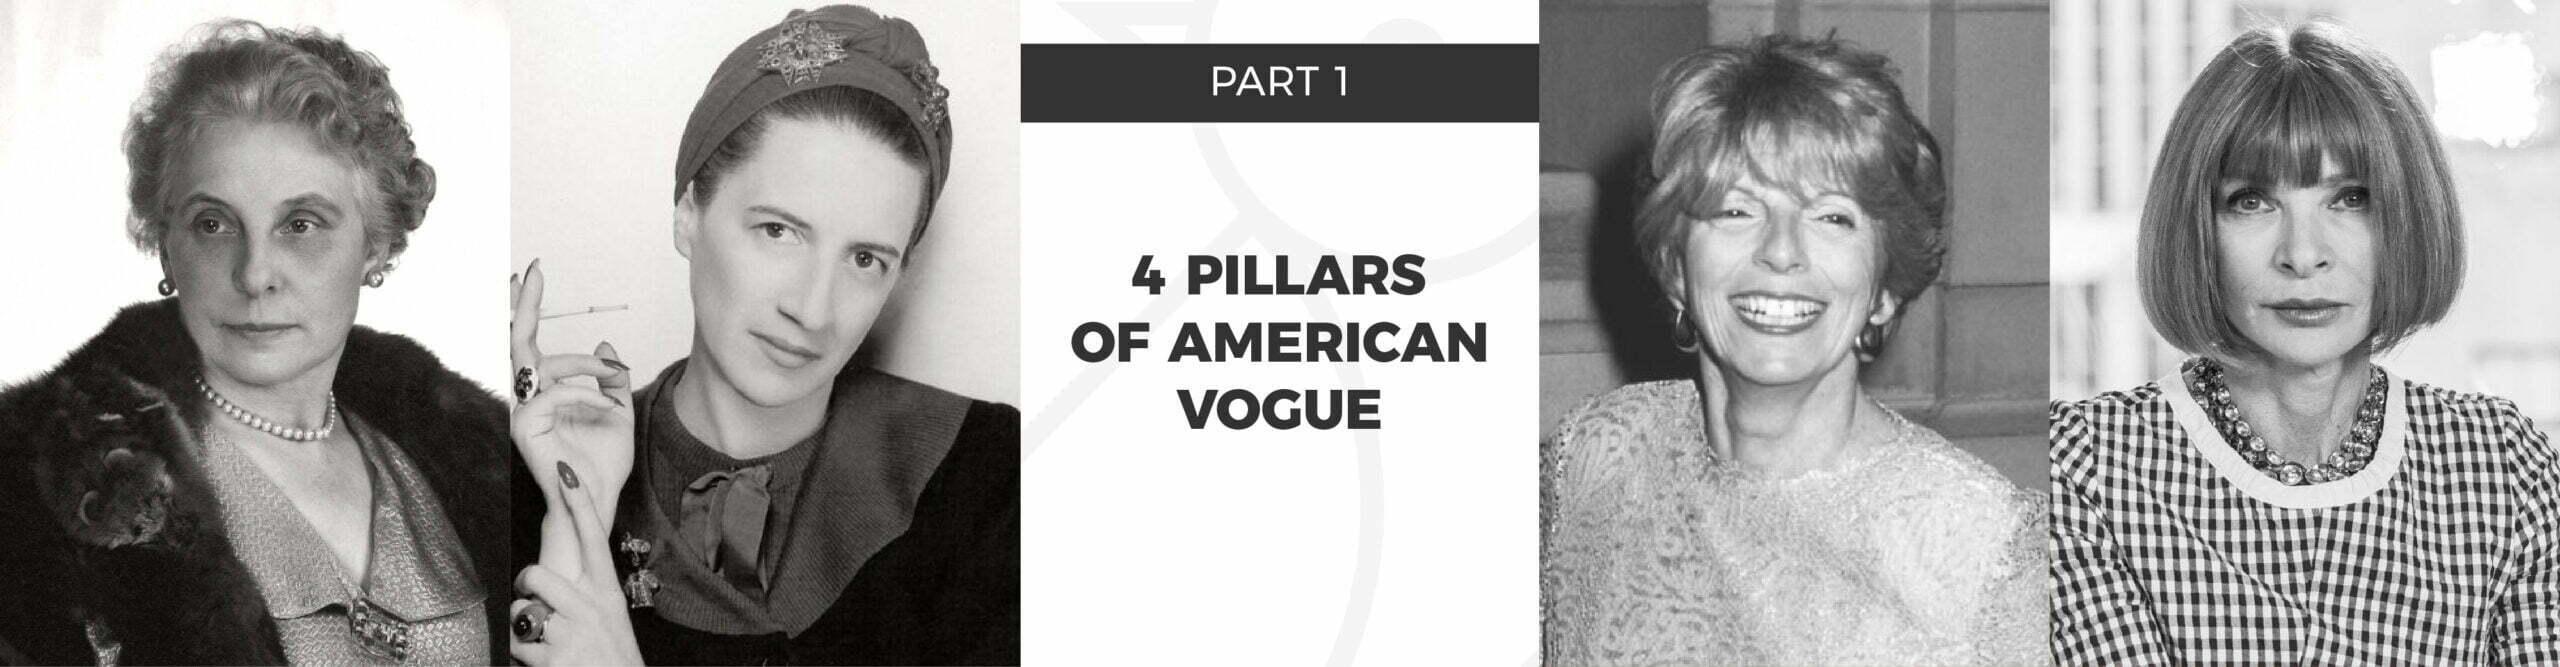 4 pillars of American Vogue